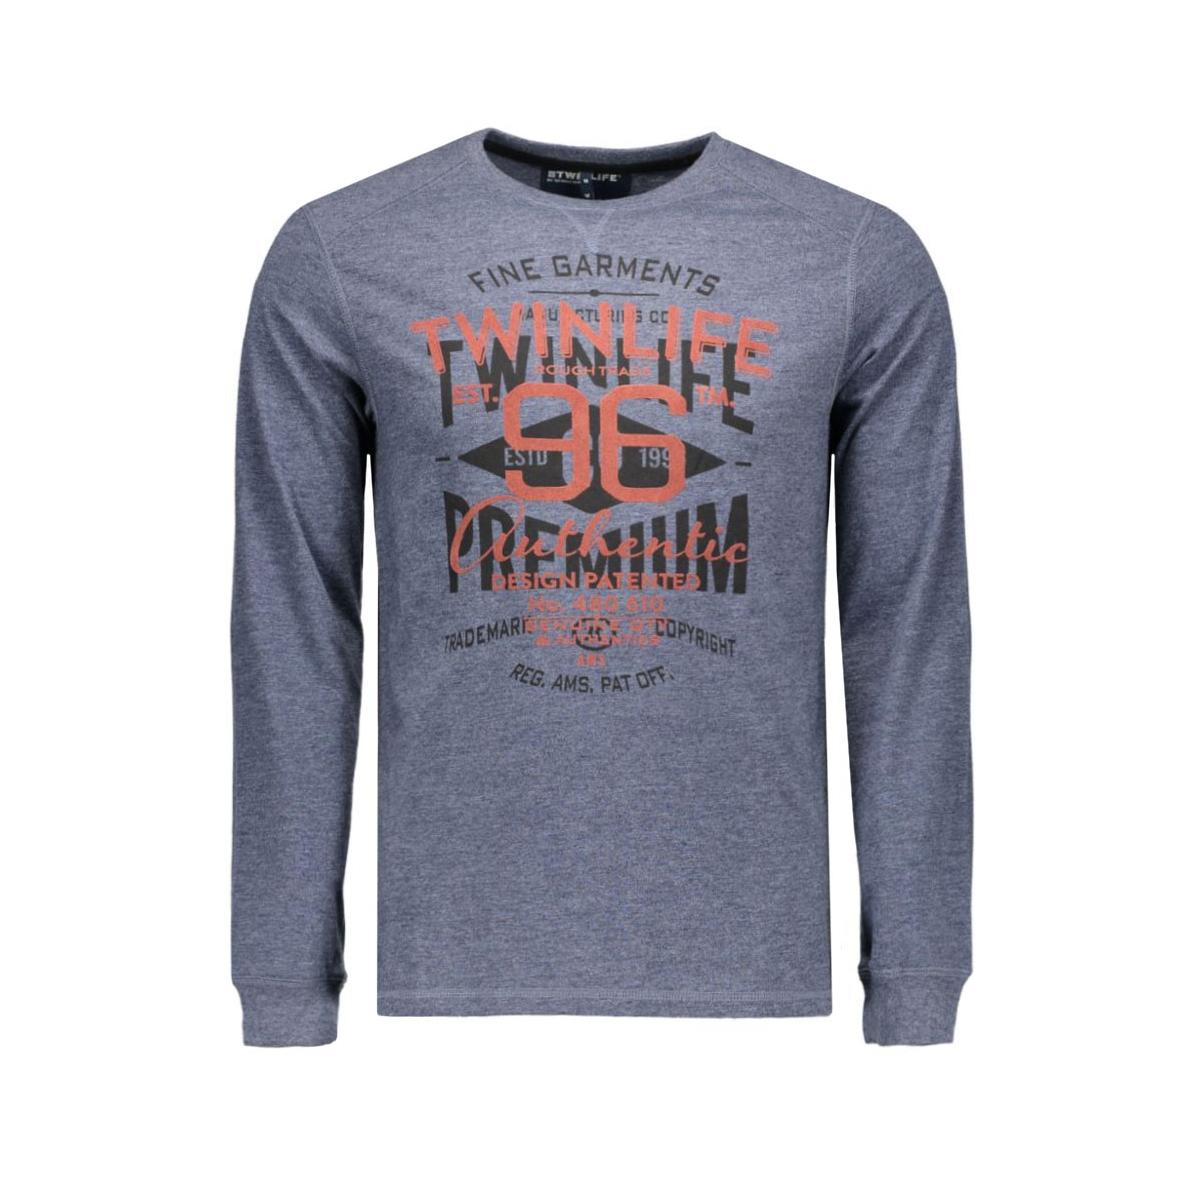 mls651815 twinlife t-shirt 6991 navy